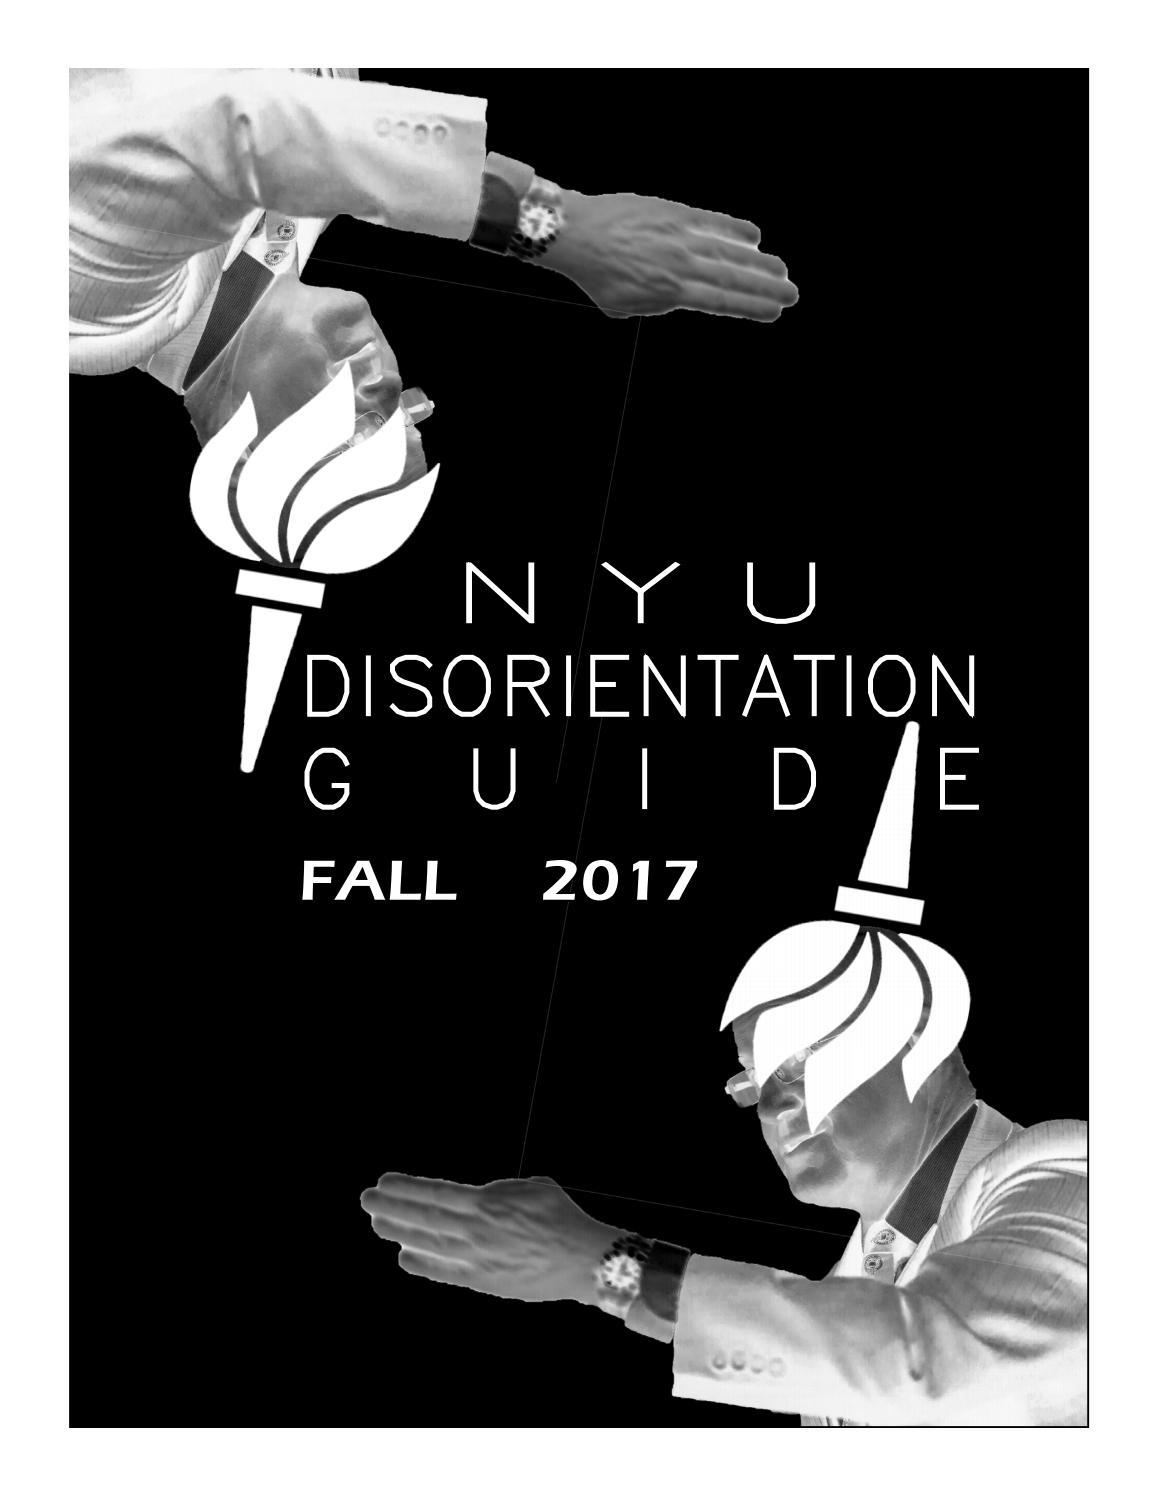 Nyu Disorientation Guide 2017 2018 By Nyu Disorientation Issuu